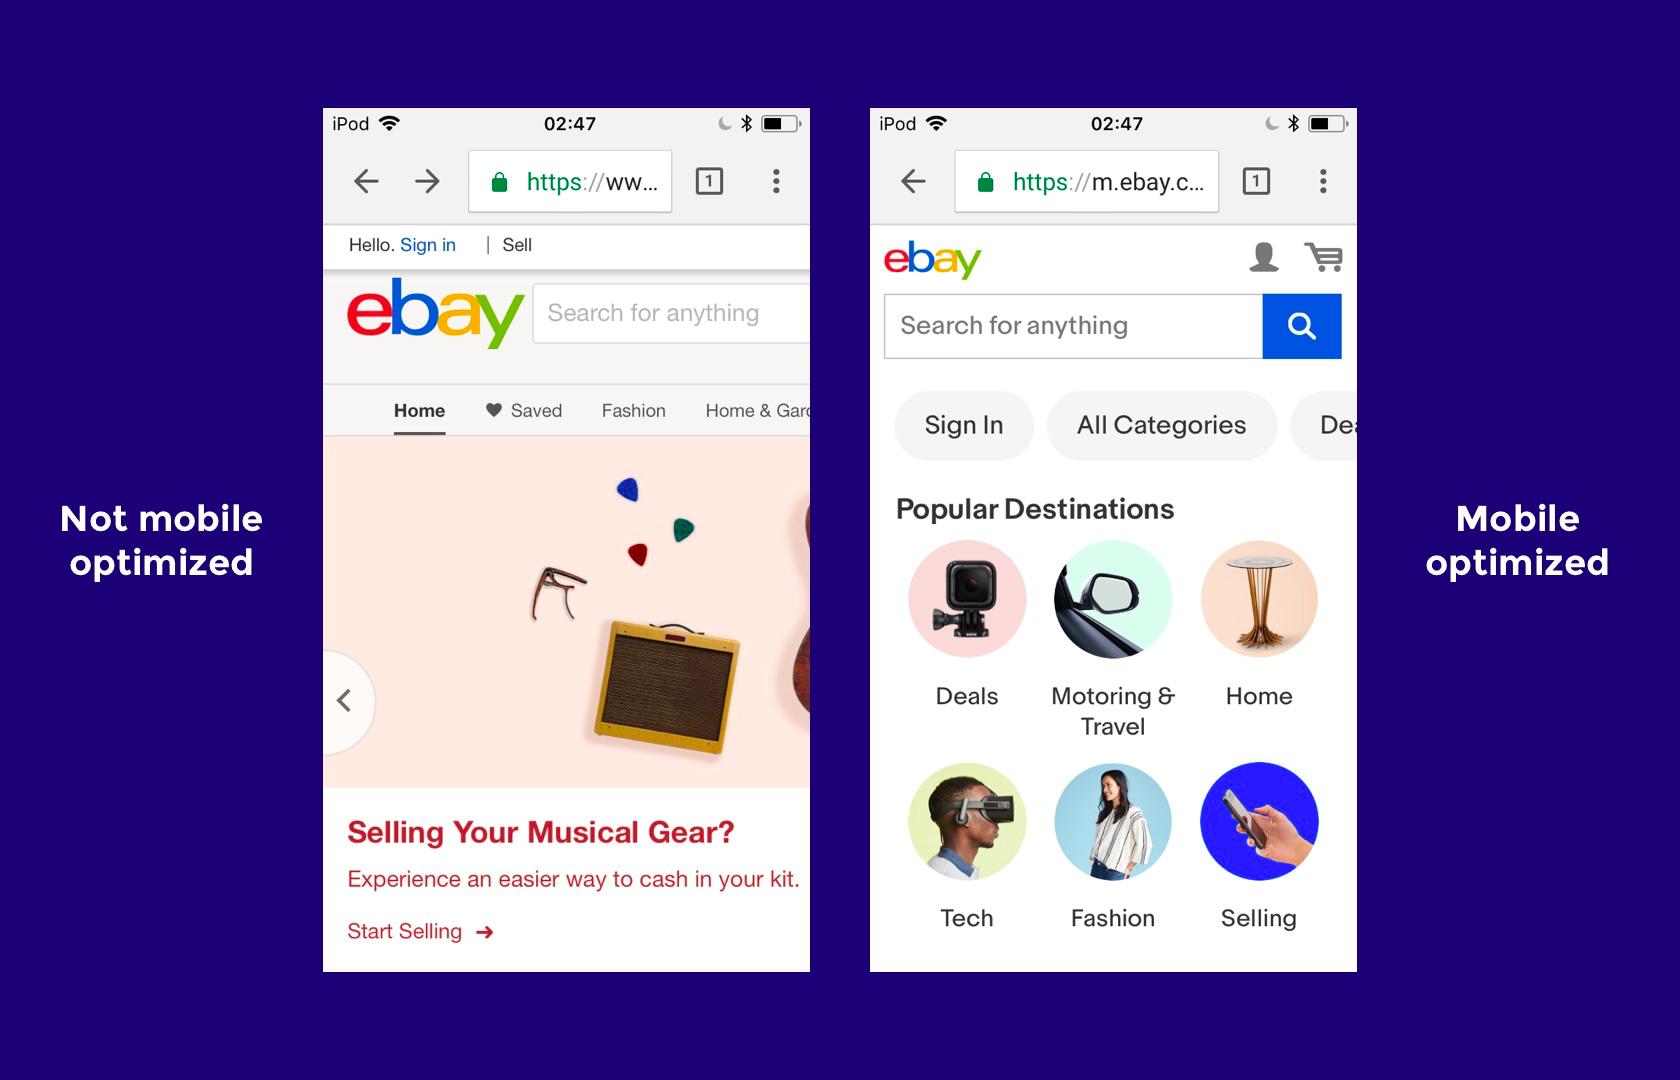 ebay: a responsive web design example